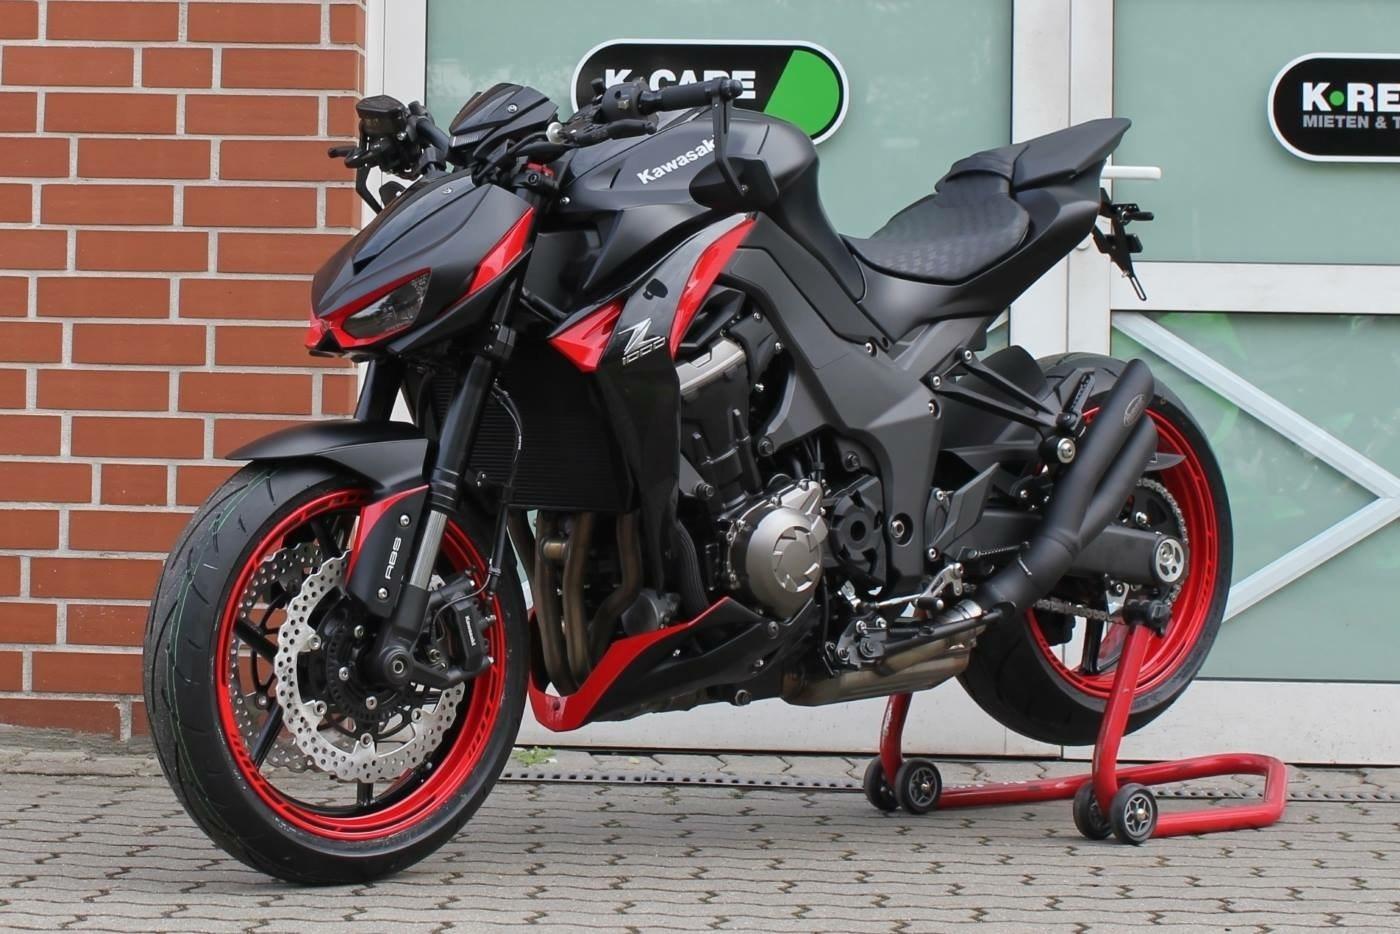 Umgebautes Motorrad Kawasaki Z 750 Black Edition von